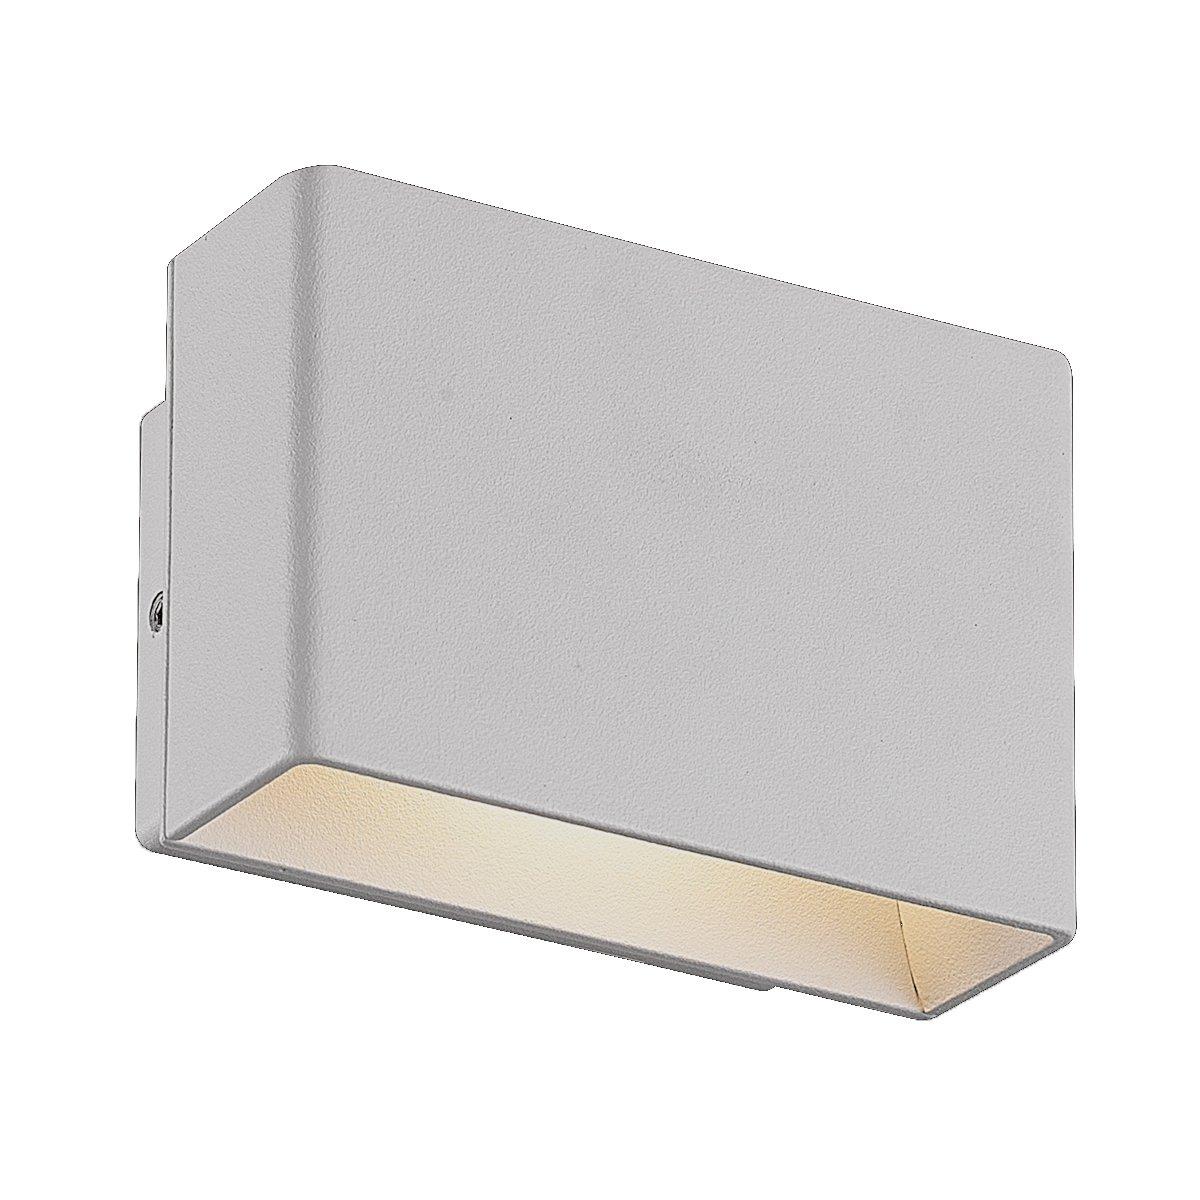 Eurofase 28282-013 Modern Vello LED Outdoor Wall Mount by Eurofase  B00T6H7M4A